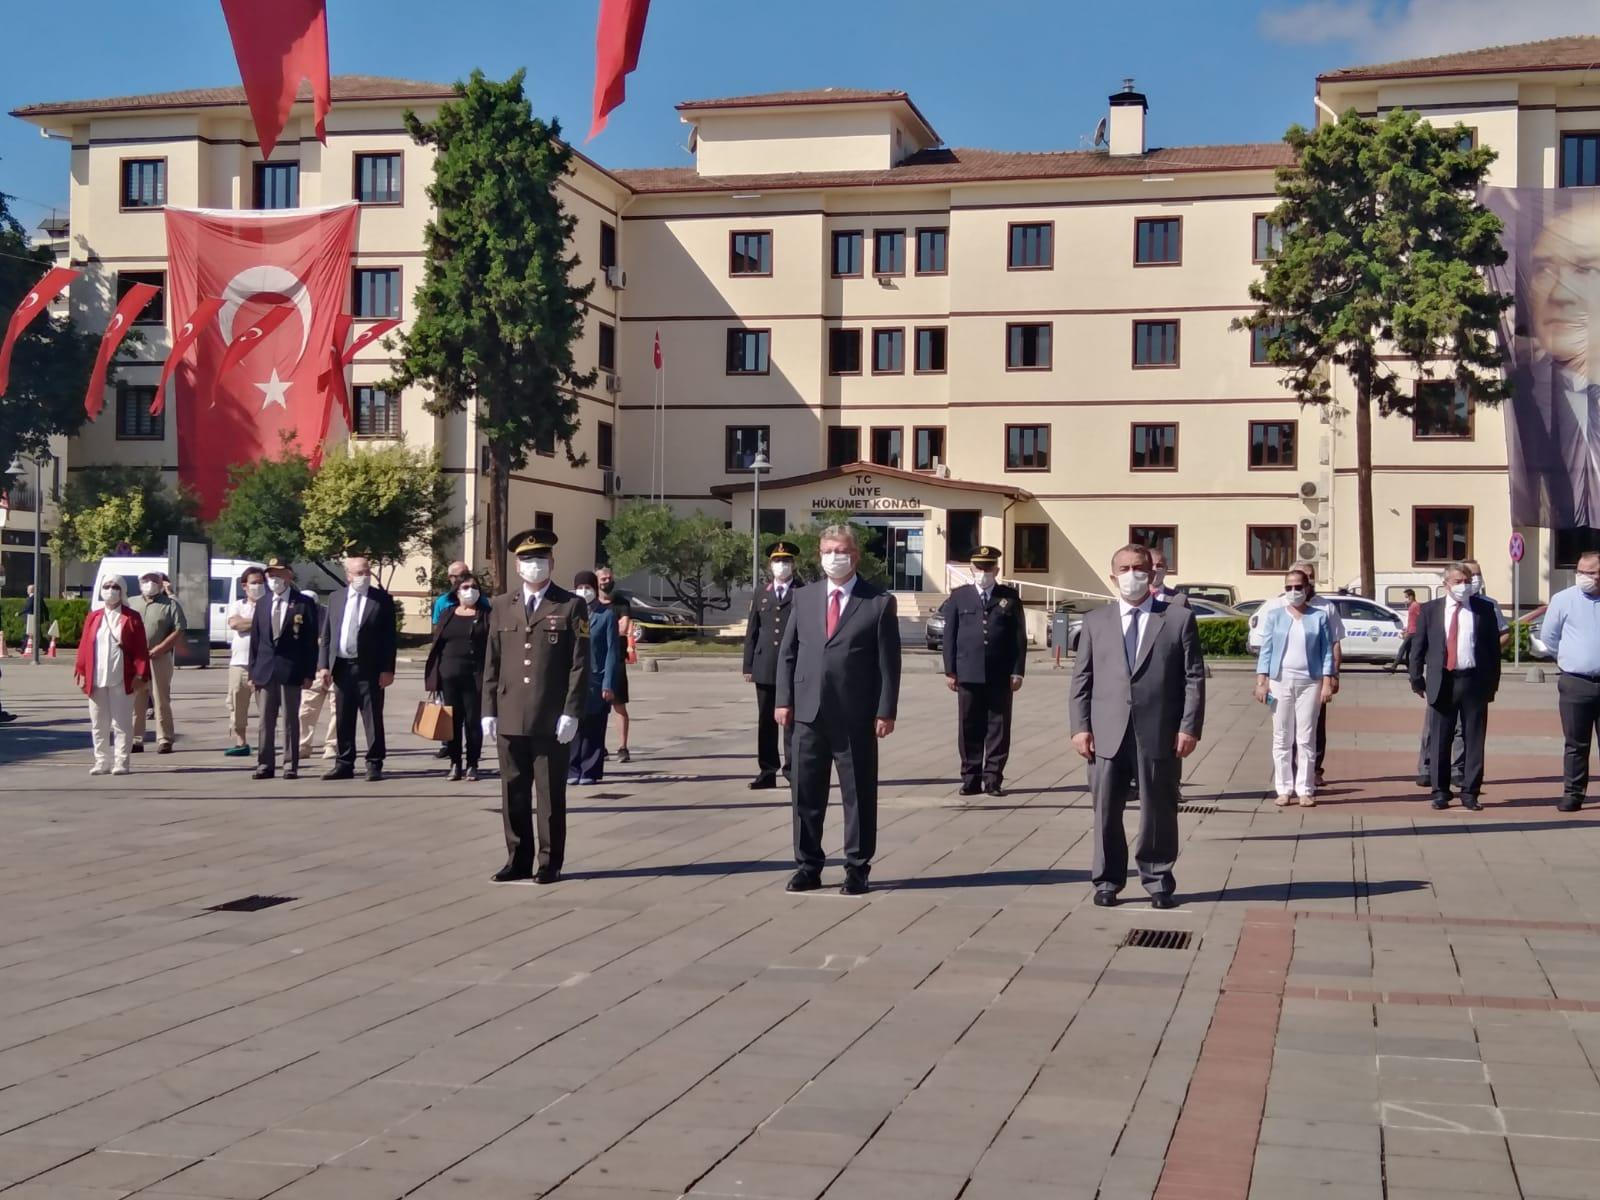 30 AĞUSTOS ZAFER BAYRAMI COVİD-19 GÖLGESİNDE KUTLANDI